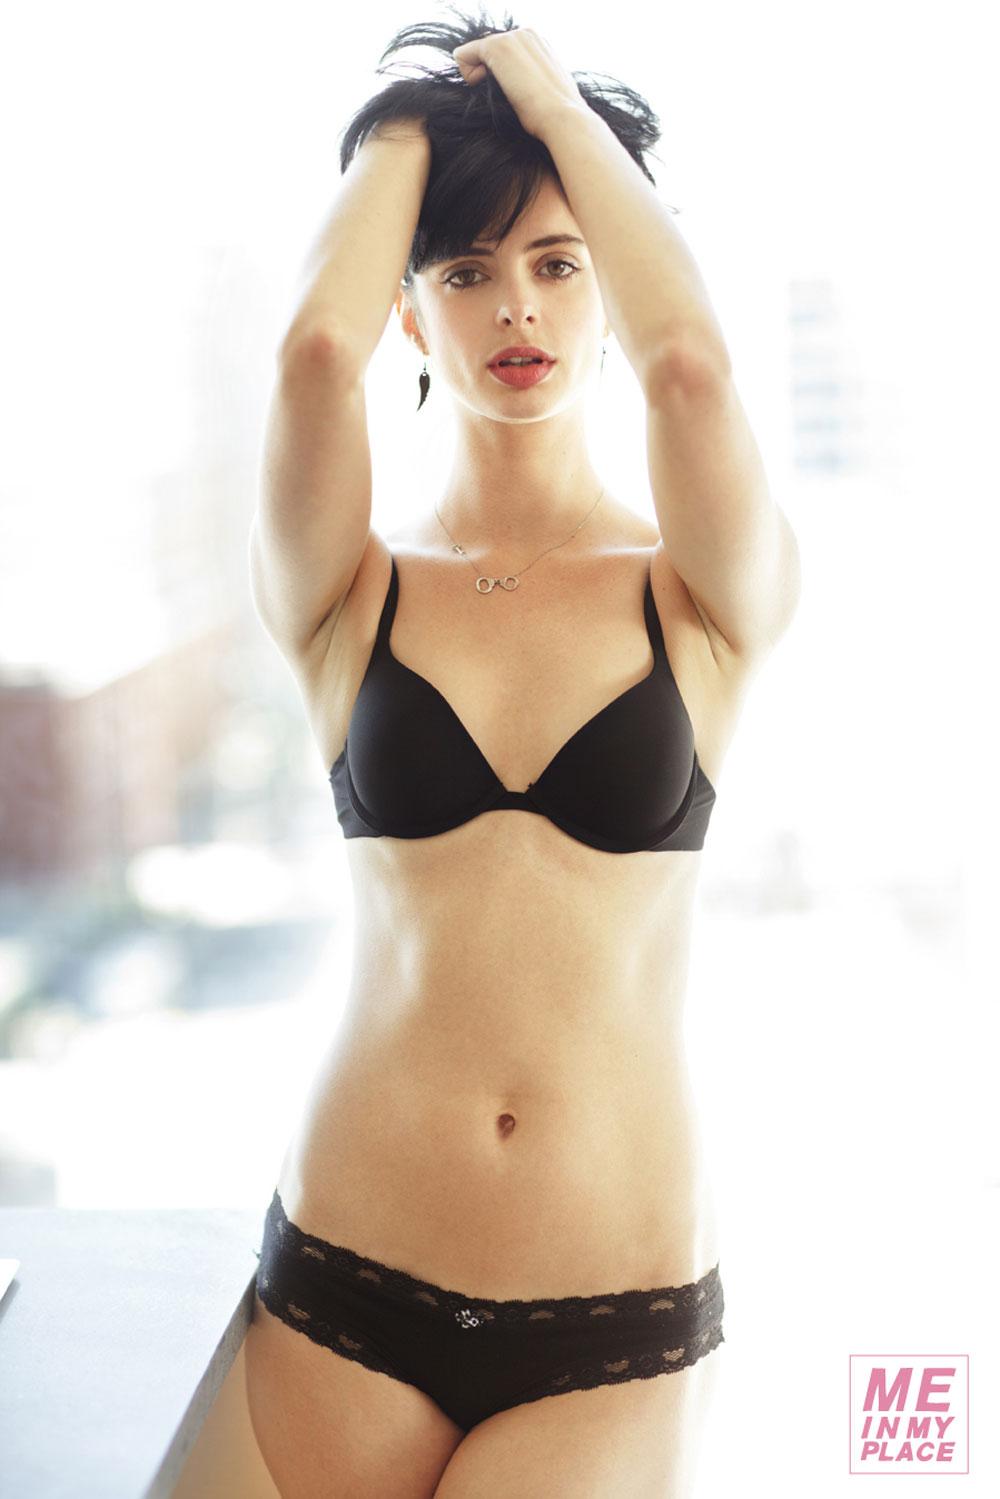 ICloud Krysten Ritter naked (43 images), Bikini